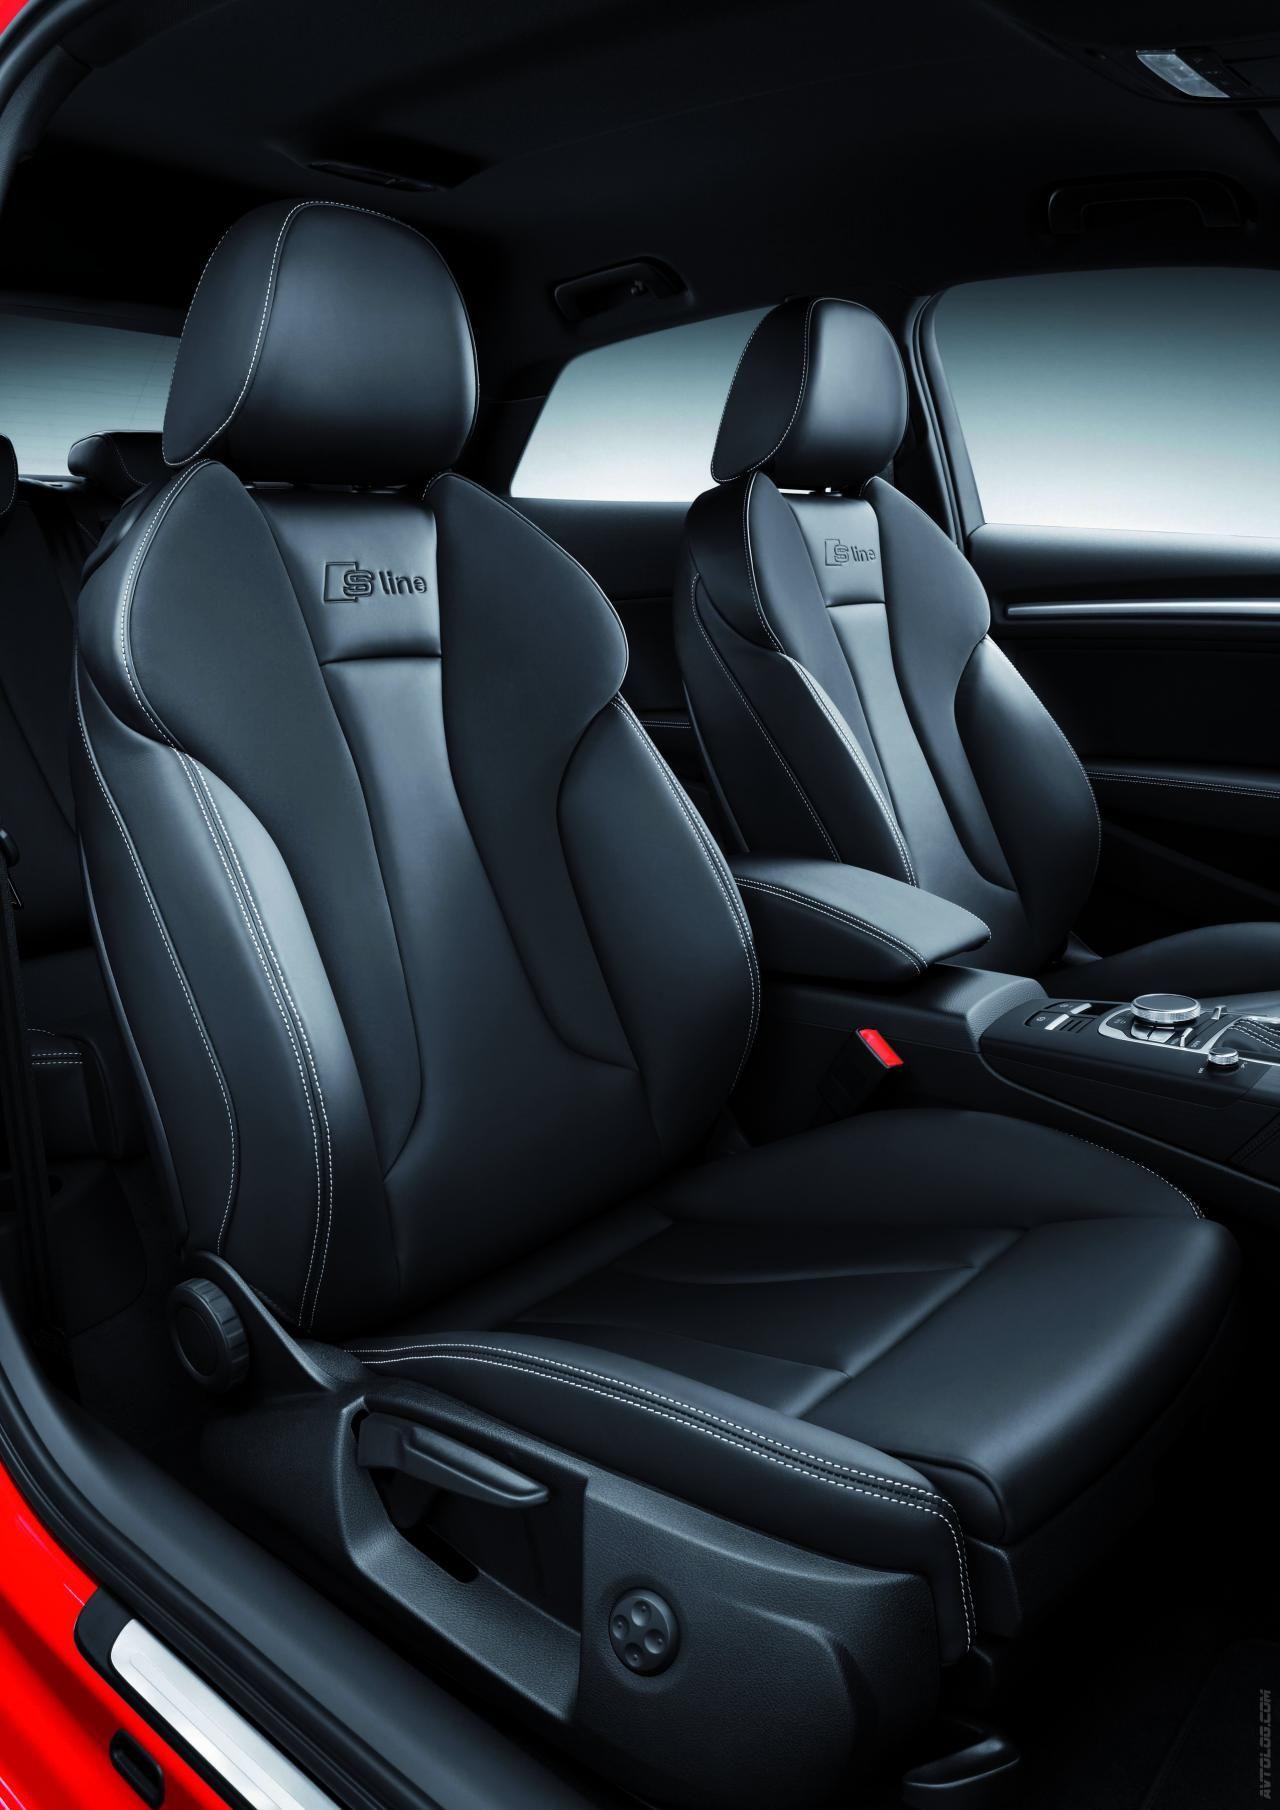 Audi A3 SLine Audi a3 sportback, Audi sportback, Luxury